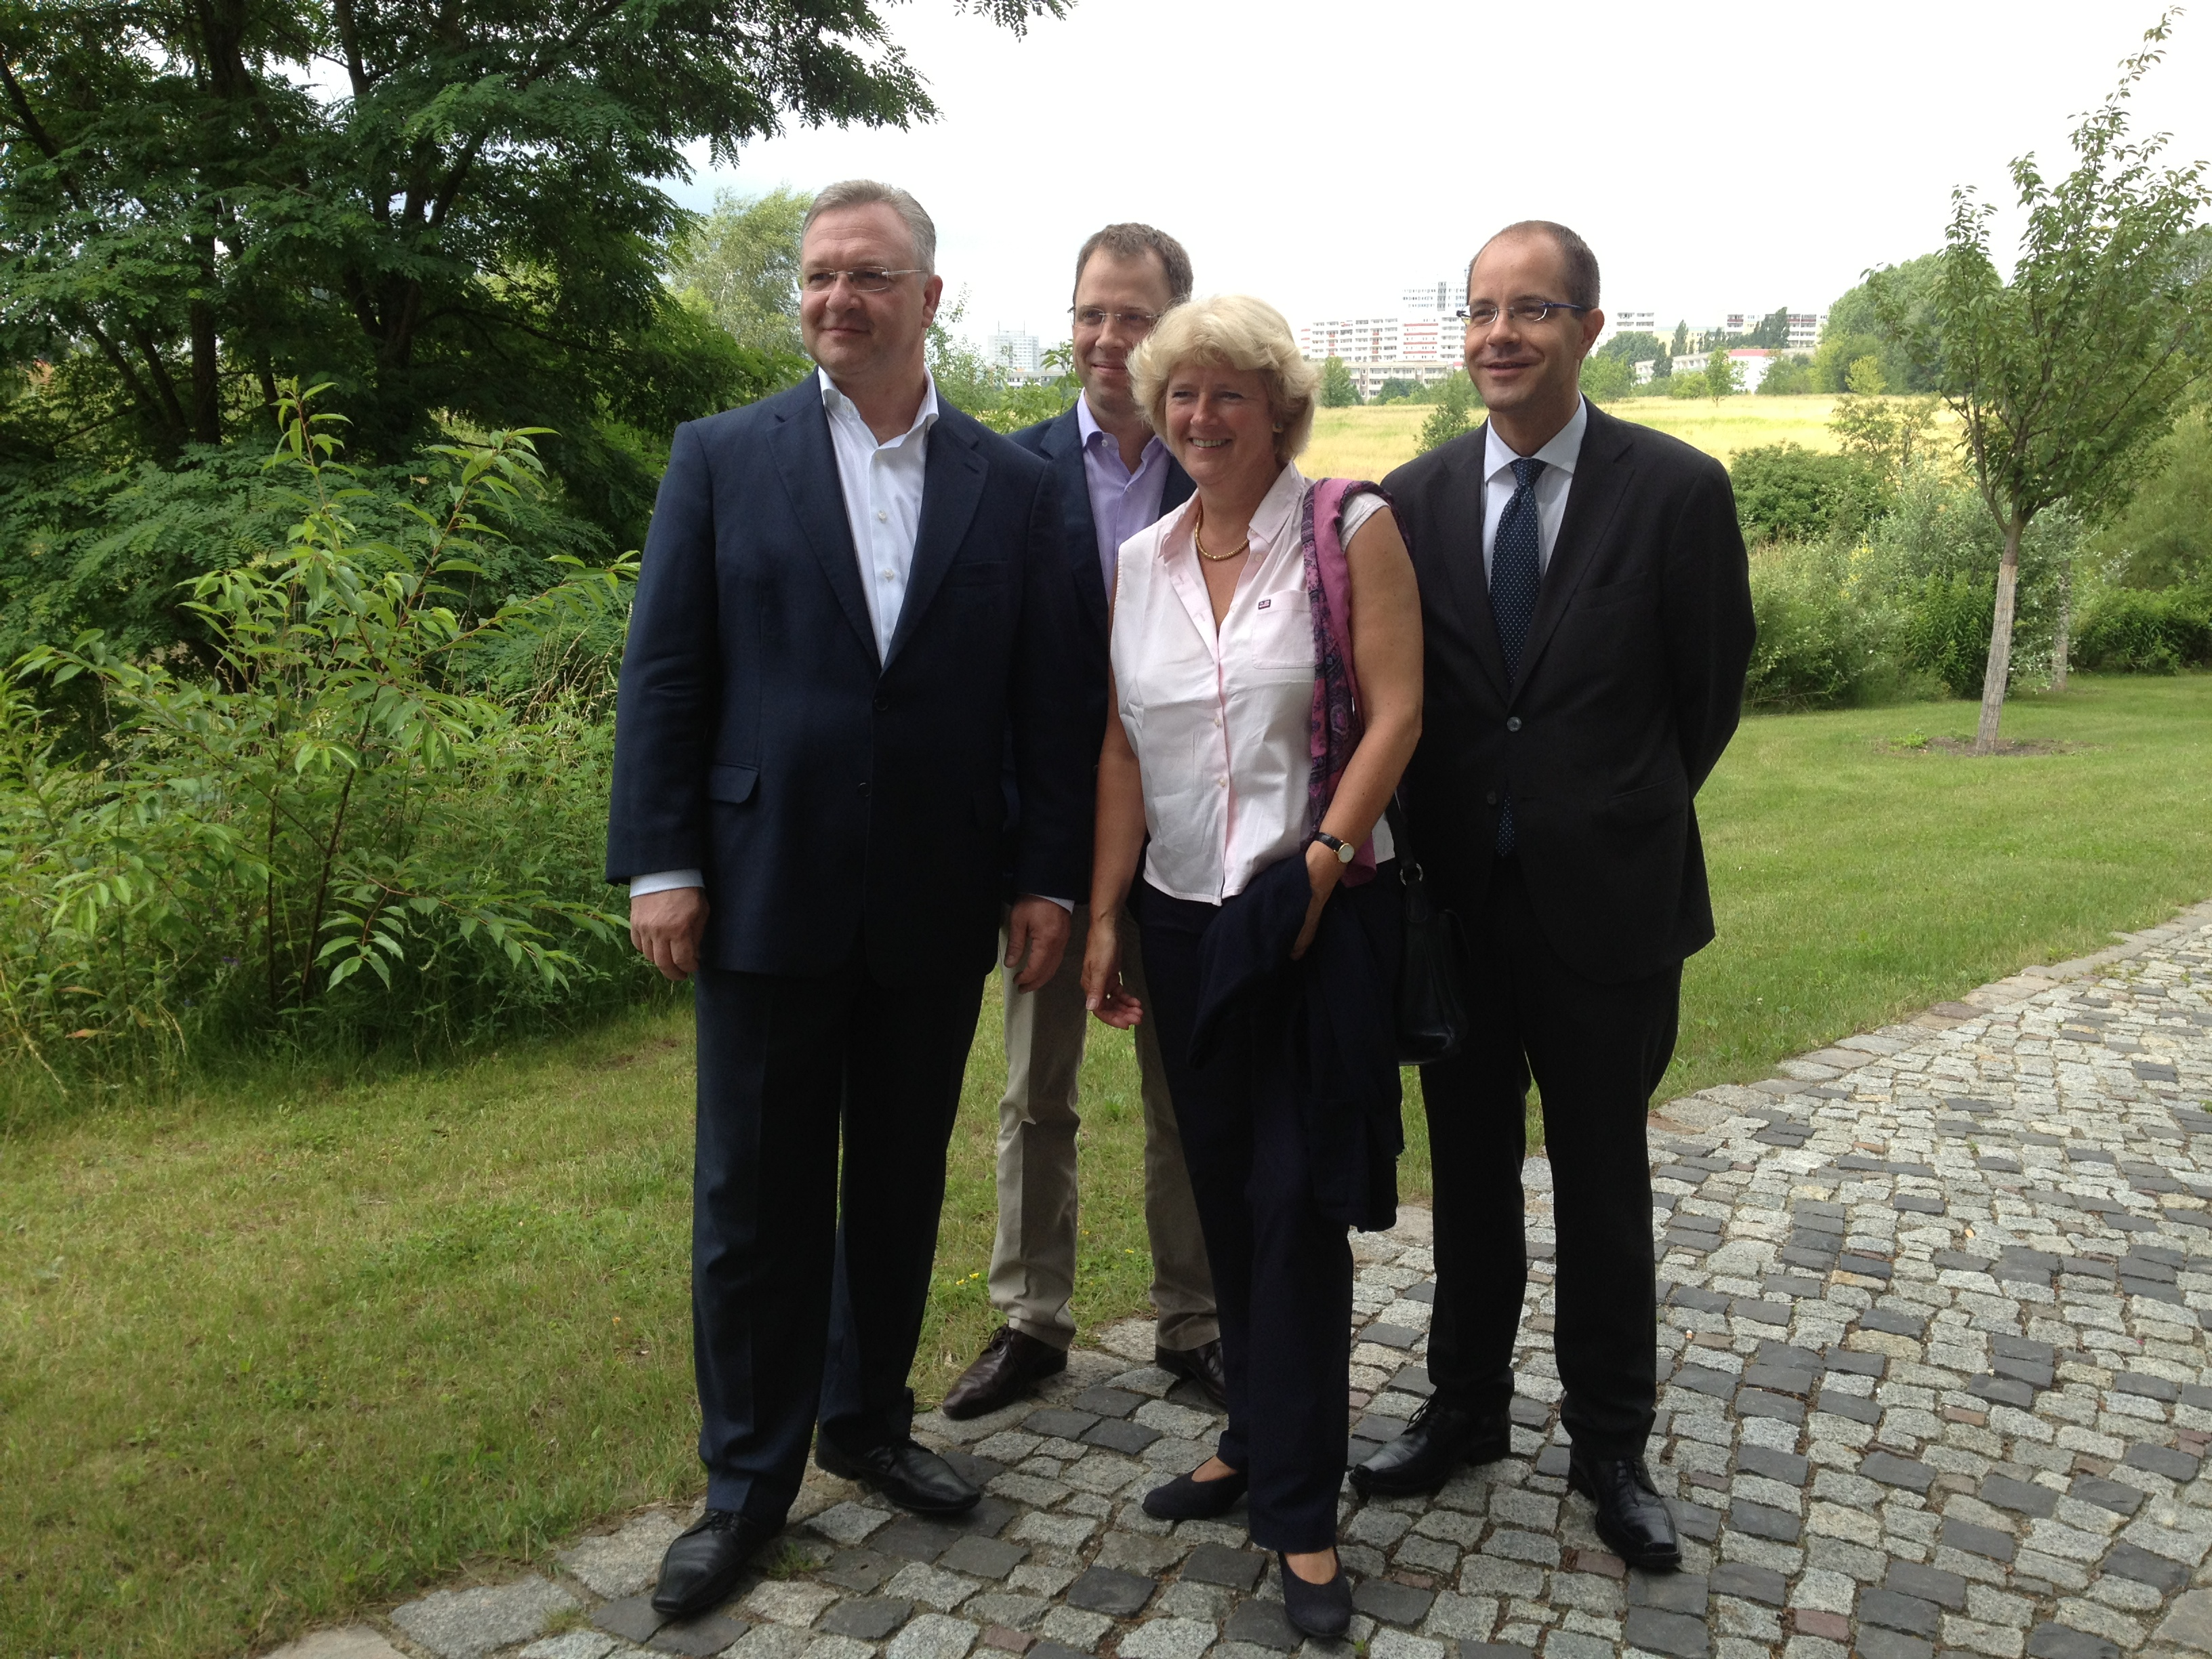 Frank Henkel, Mario Czaja, Monika Grütters und Christian Gräff im Erholungspark Marzahn